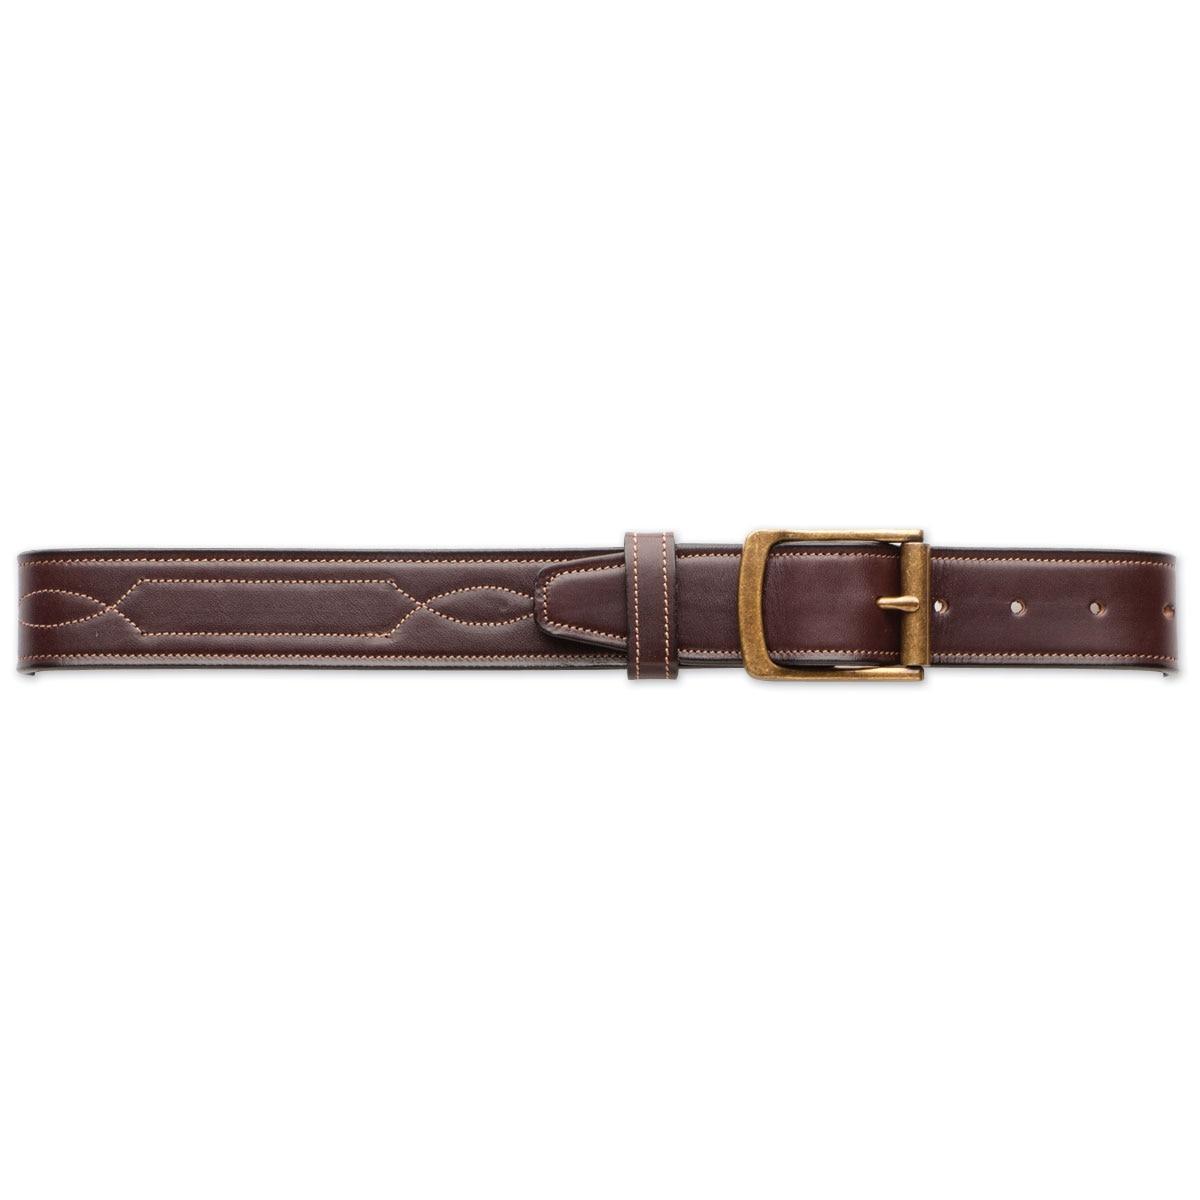 Tory Leather 1.5 Stitched Pattern Belt